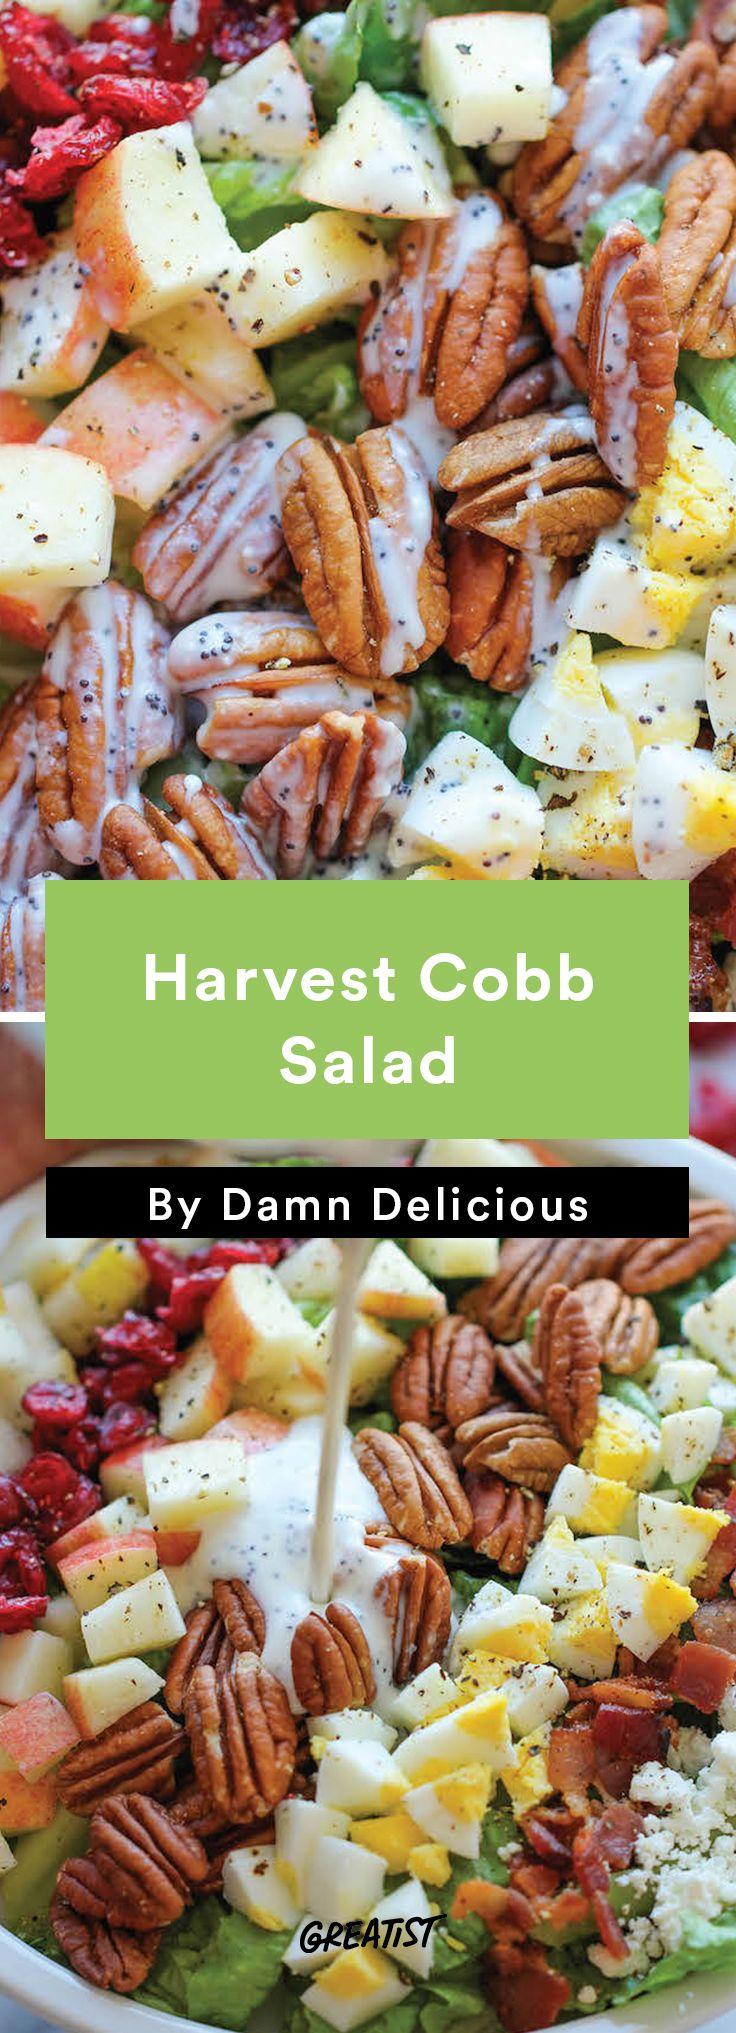 4. Harvest Cobb Salad #healthy #salads #fall http://greatist.com/eat/healthy-fall-salad-recipes